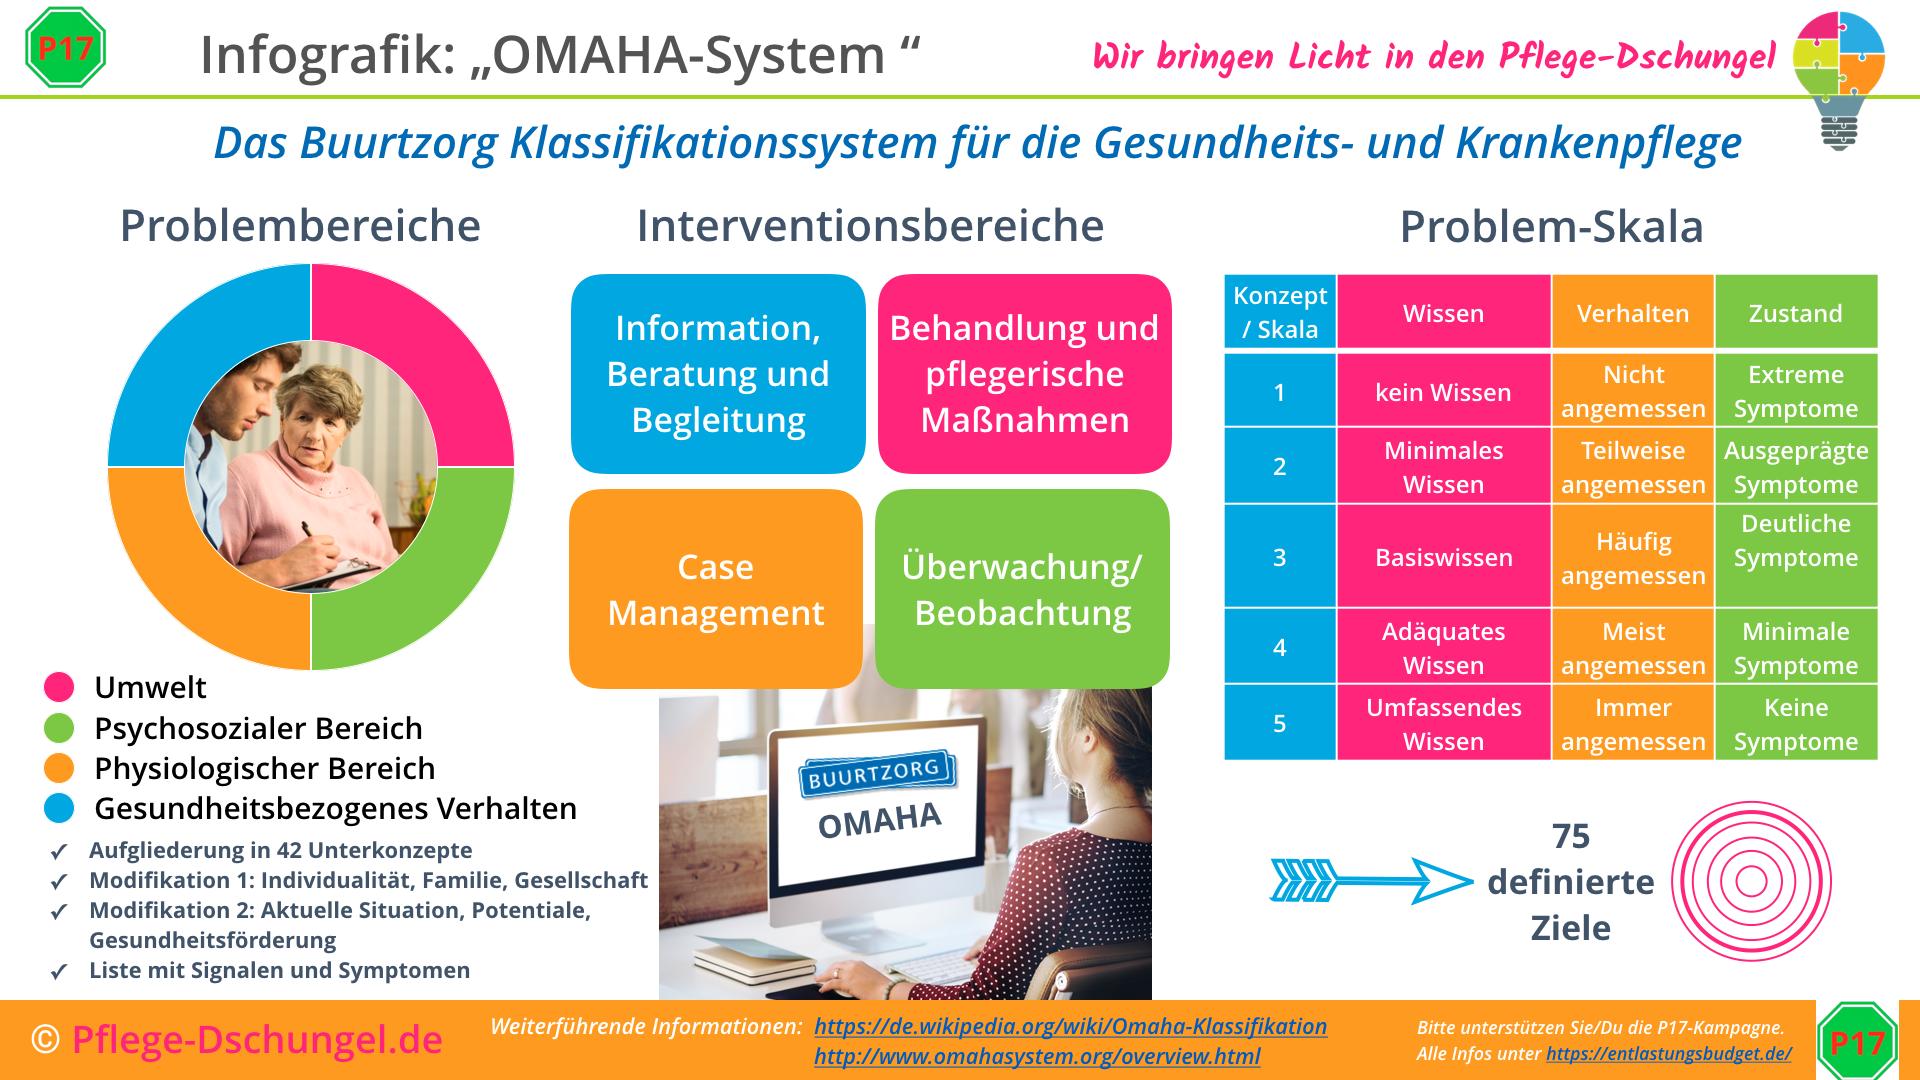 Das Buurtzorg OMAHA-System